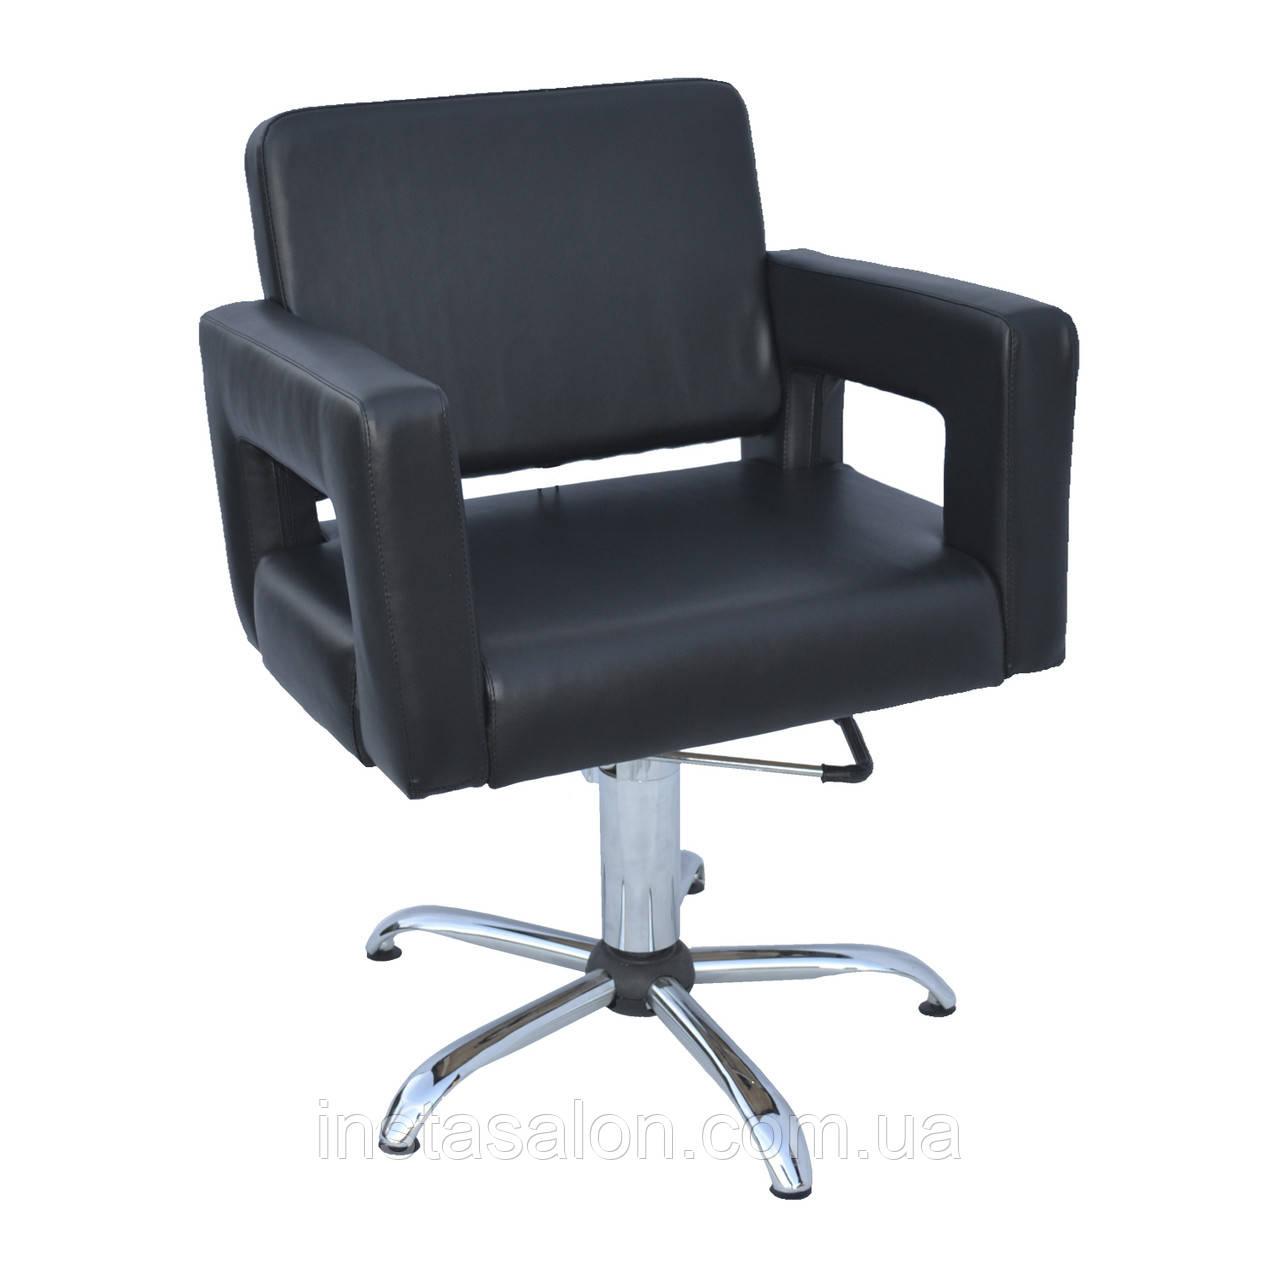 Перукарське крісло Еврика